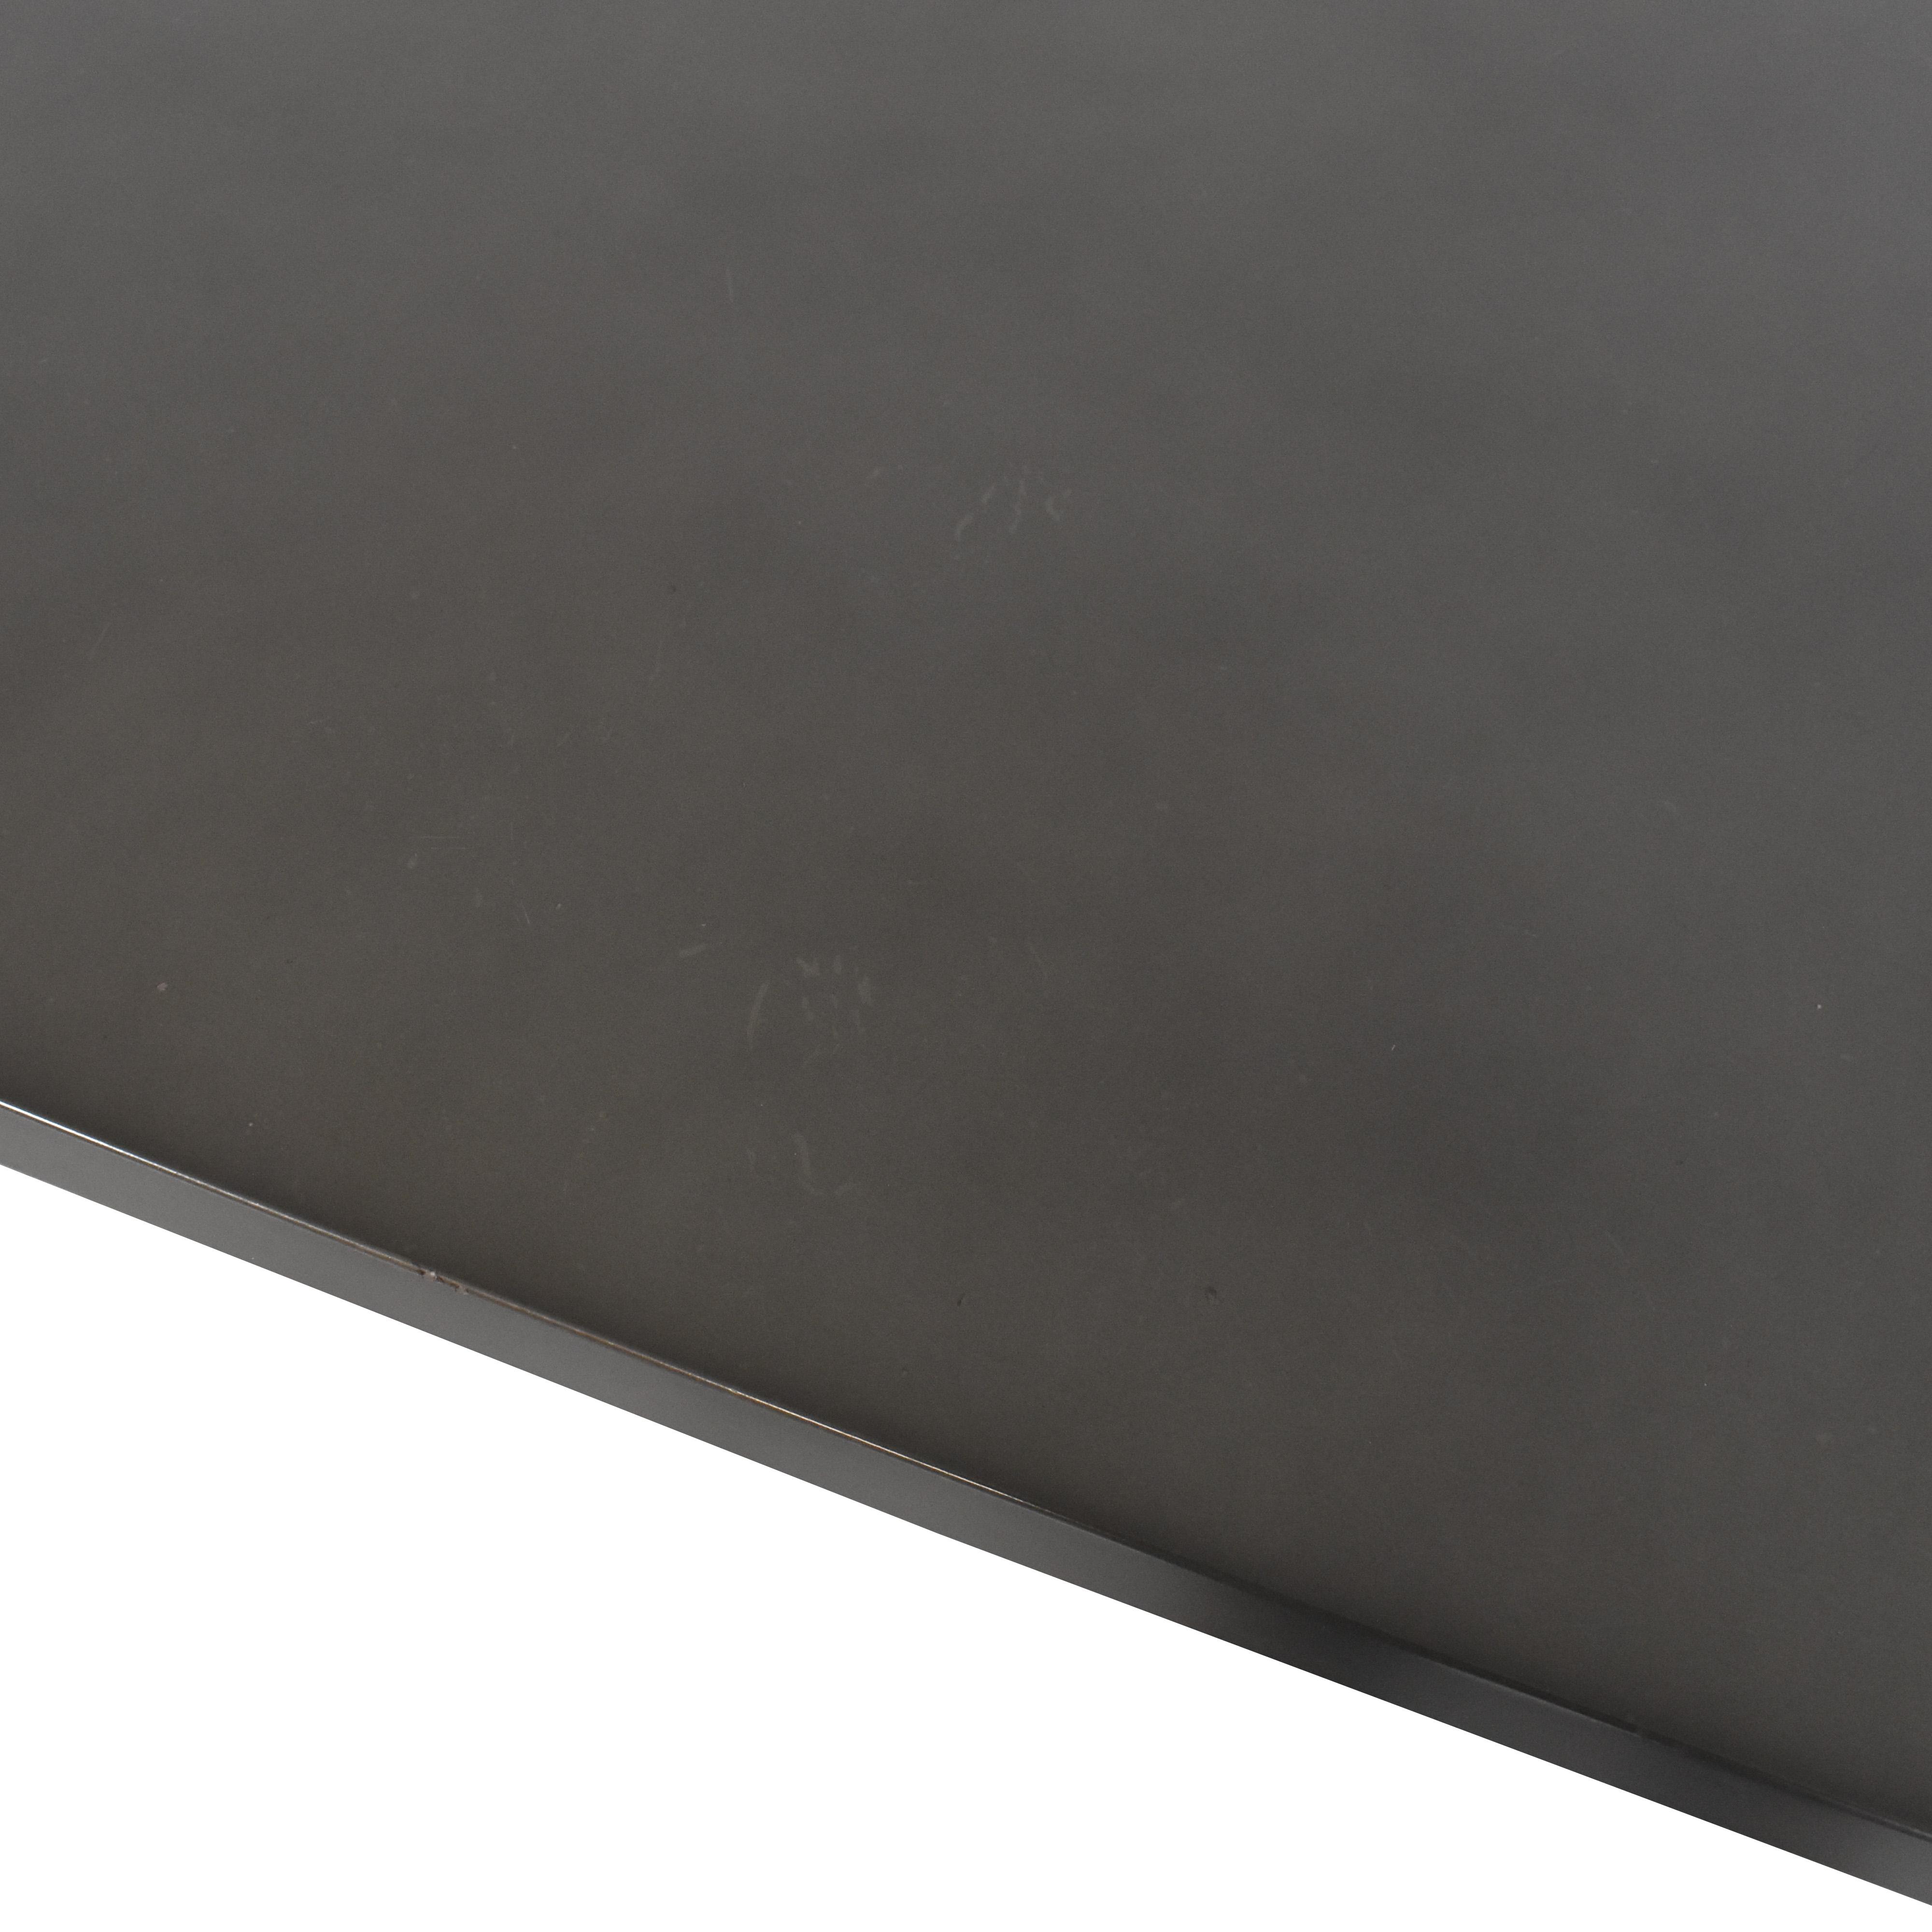 shop Restoration Hardware Reclaimed Wood & Zinc-Top Rectangular Dining Table Restoration Hardware Tables